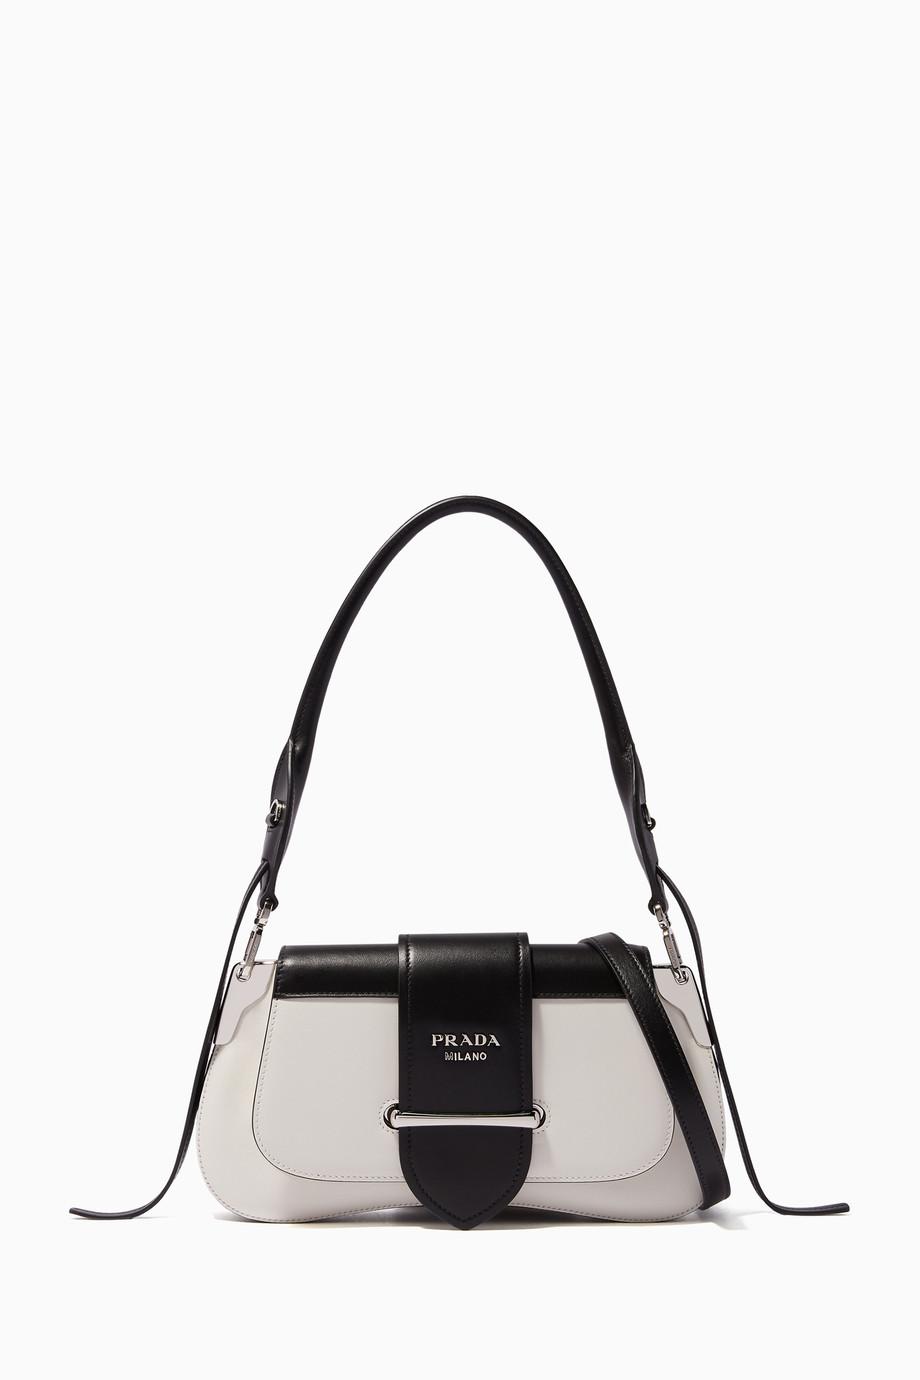 73cbf1cb75c1 Shop Prada White White & Black Small Sidonie Leather Shoulder Bag ...